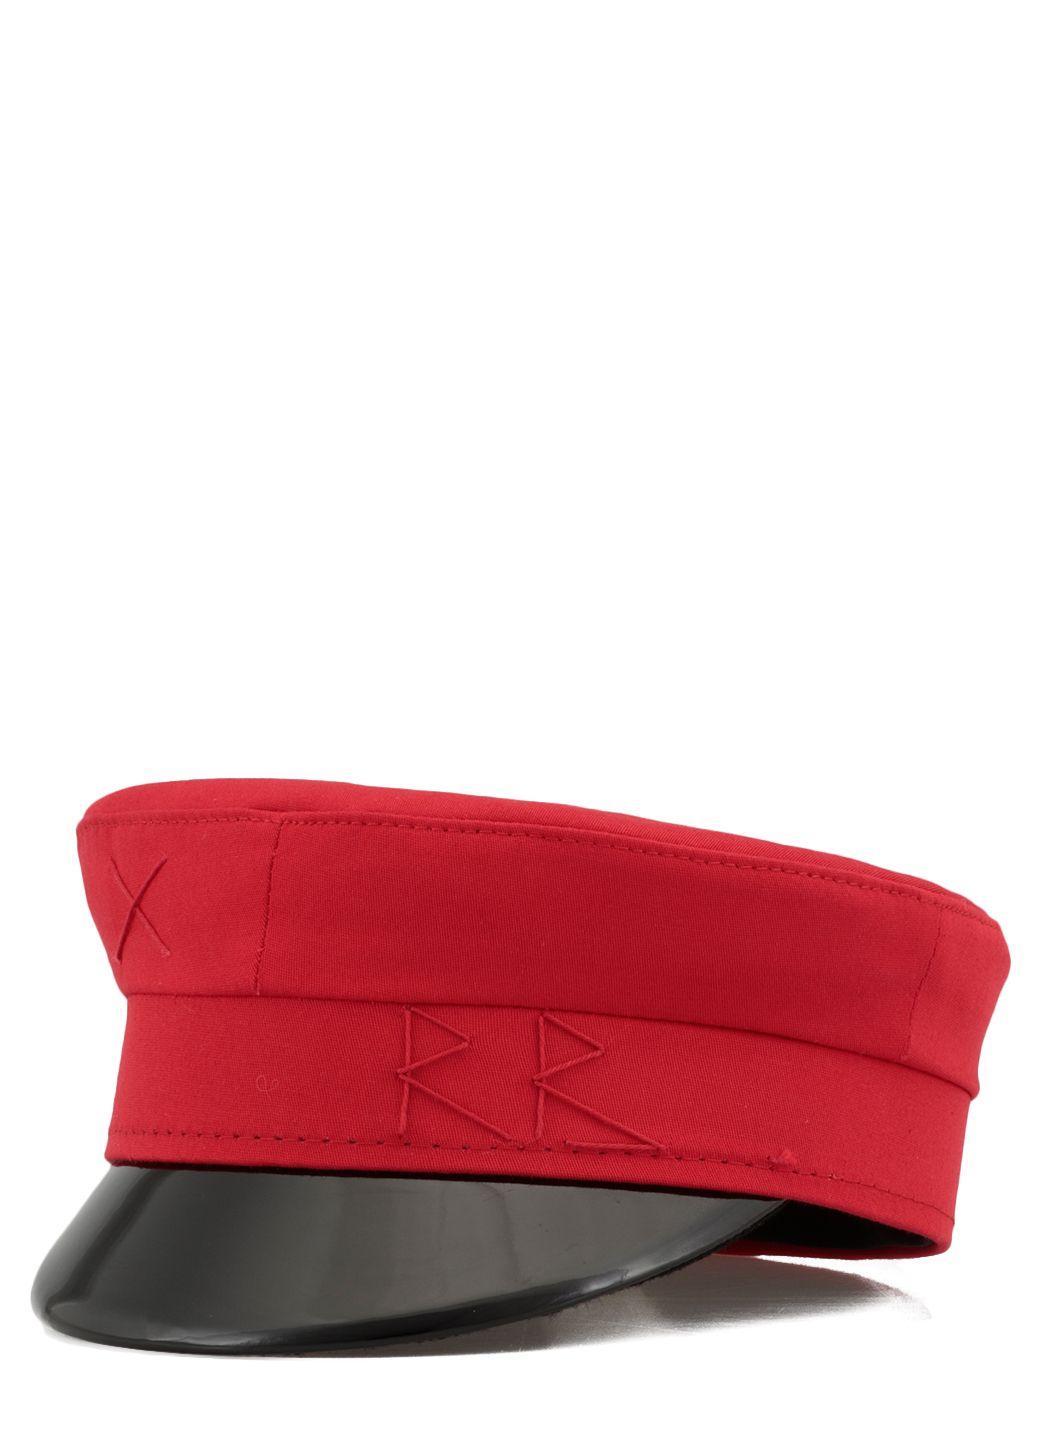 Cappello baker boy